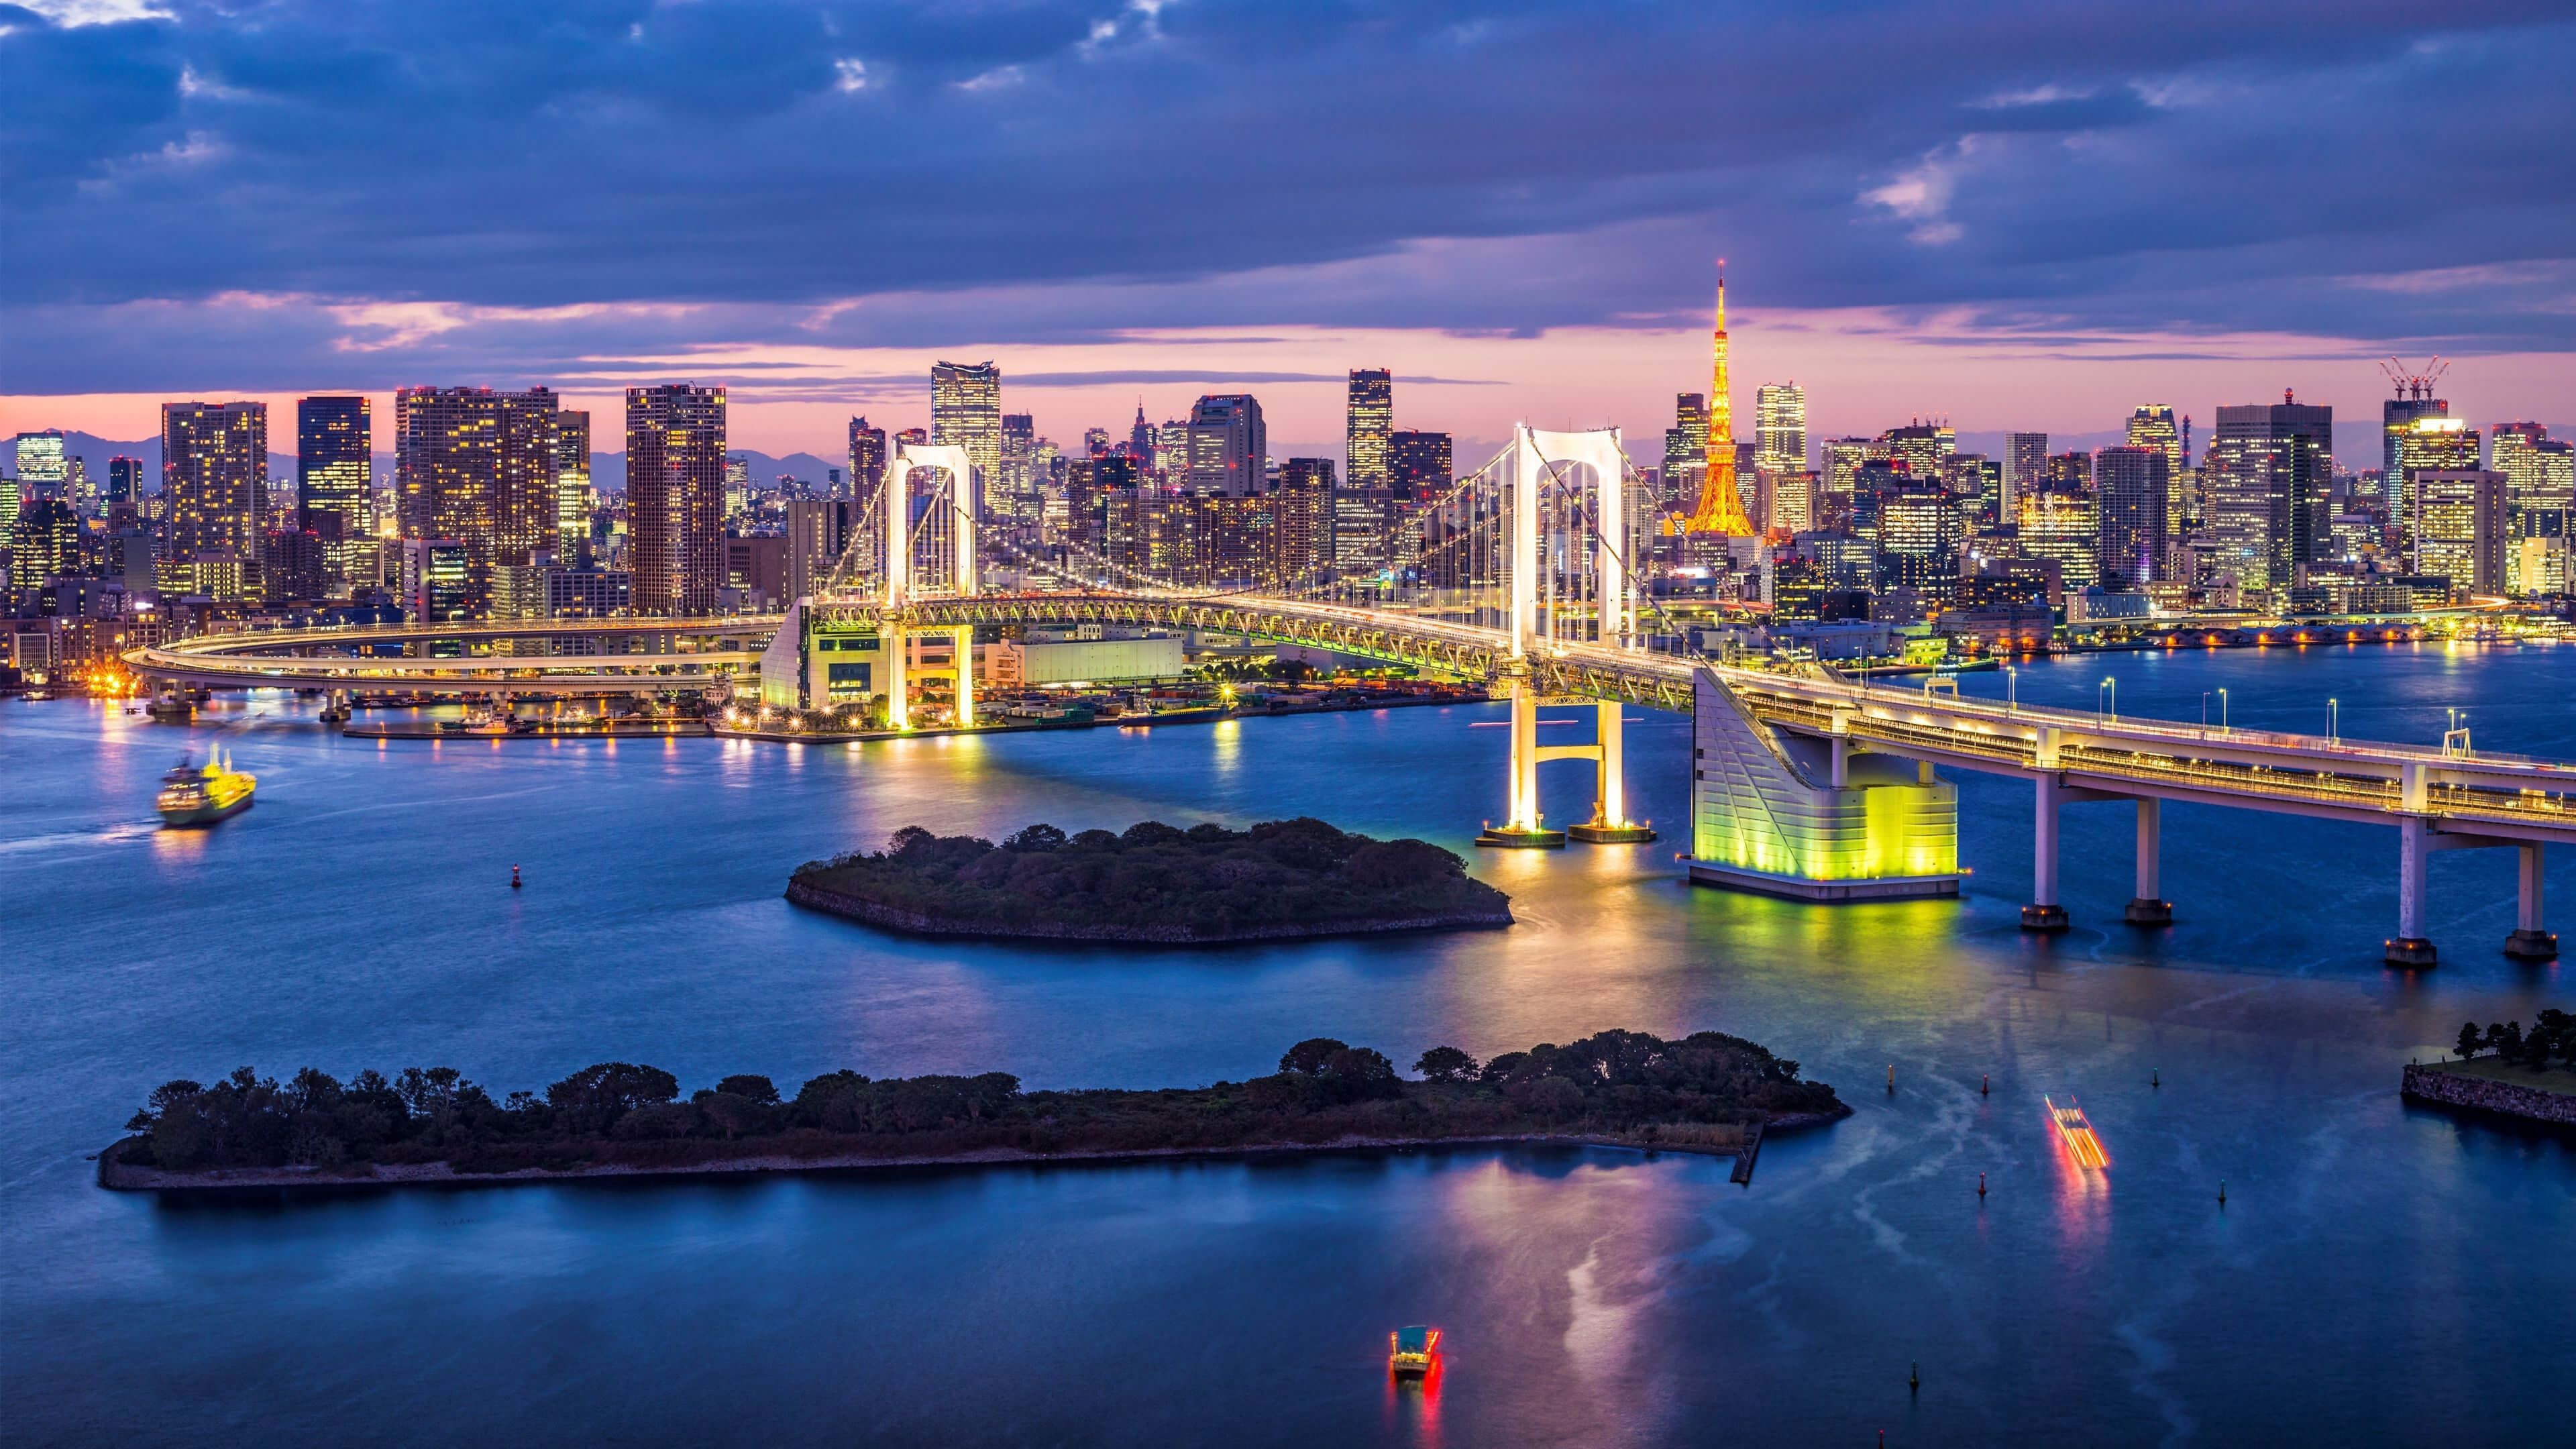 3840x2160 Rainbow Bridge Tokyo Japan Uhd 4k Wallpaper Tokyo Skyline Tokyo Bay Skyline